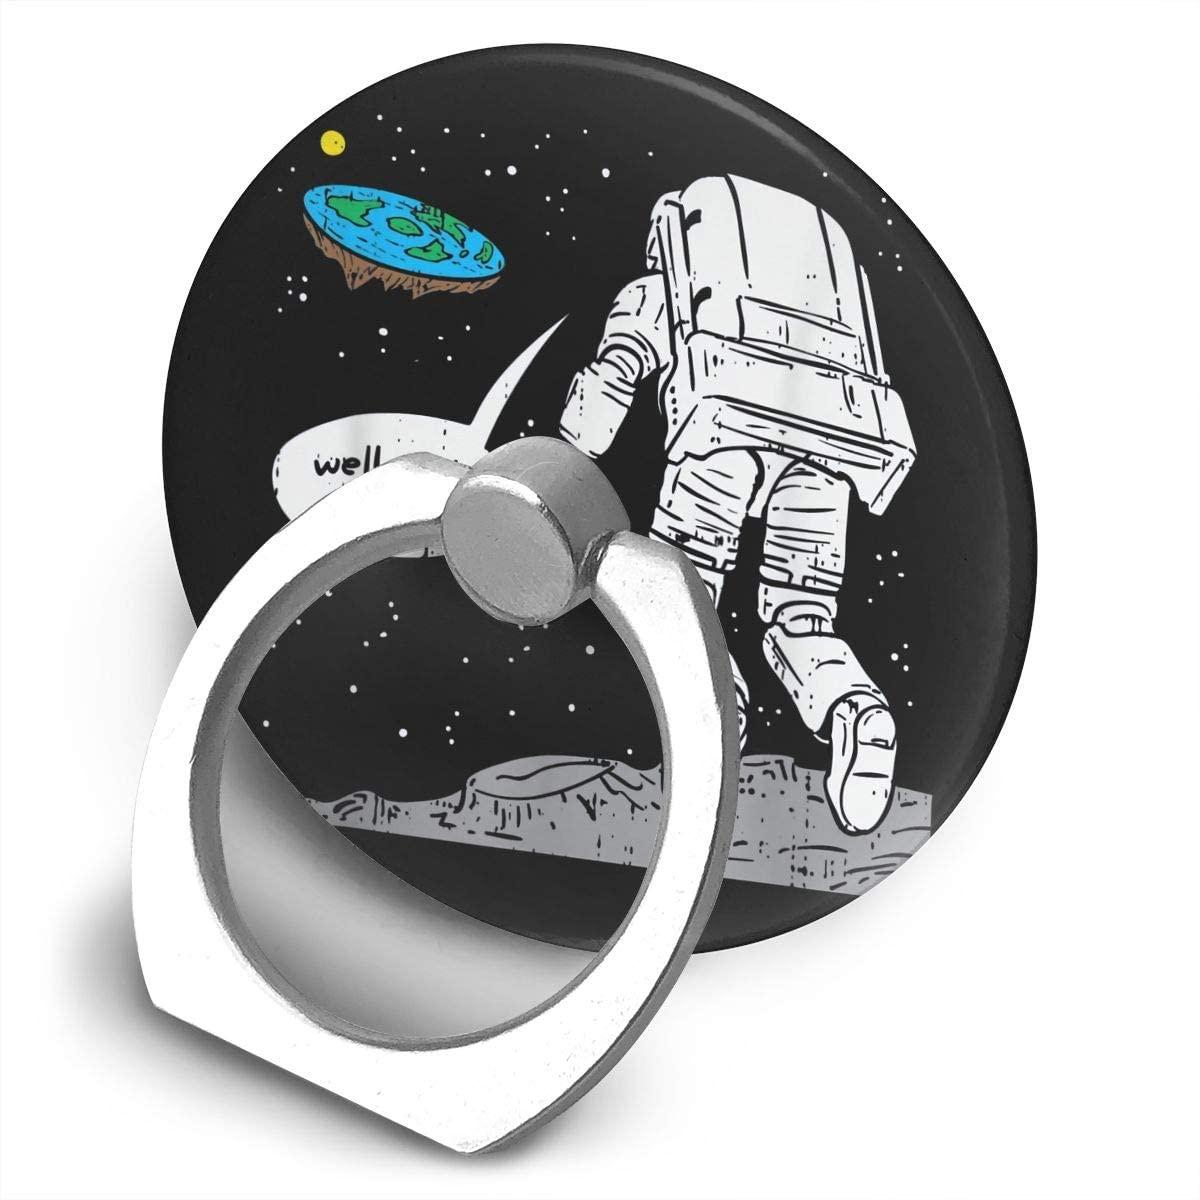 Zwj Funny Moon Landing, Flat Earth, That Sucks Alloy Mobile Phone Ring Bracket,360 Degree Rotating Ring Stand Grip Mounts